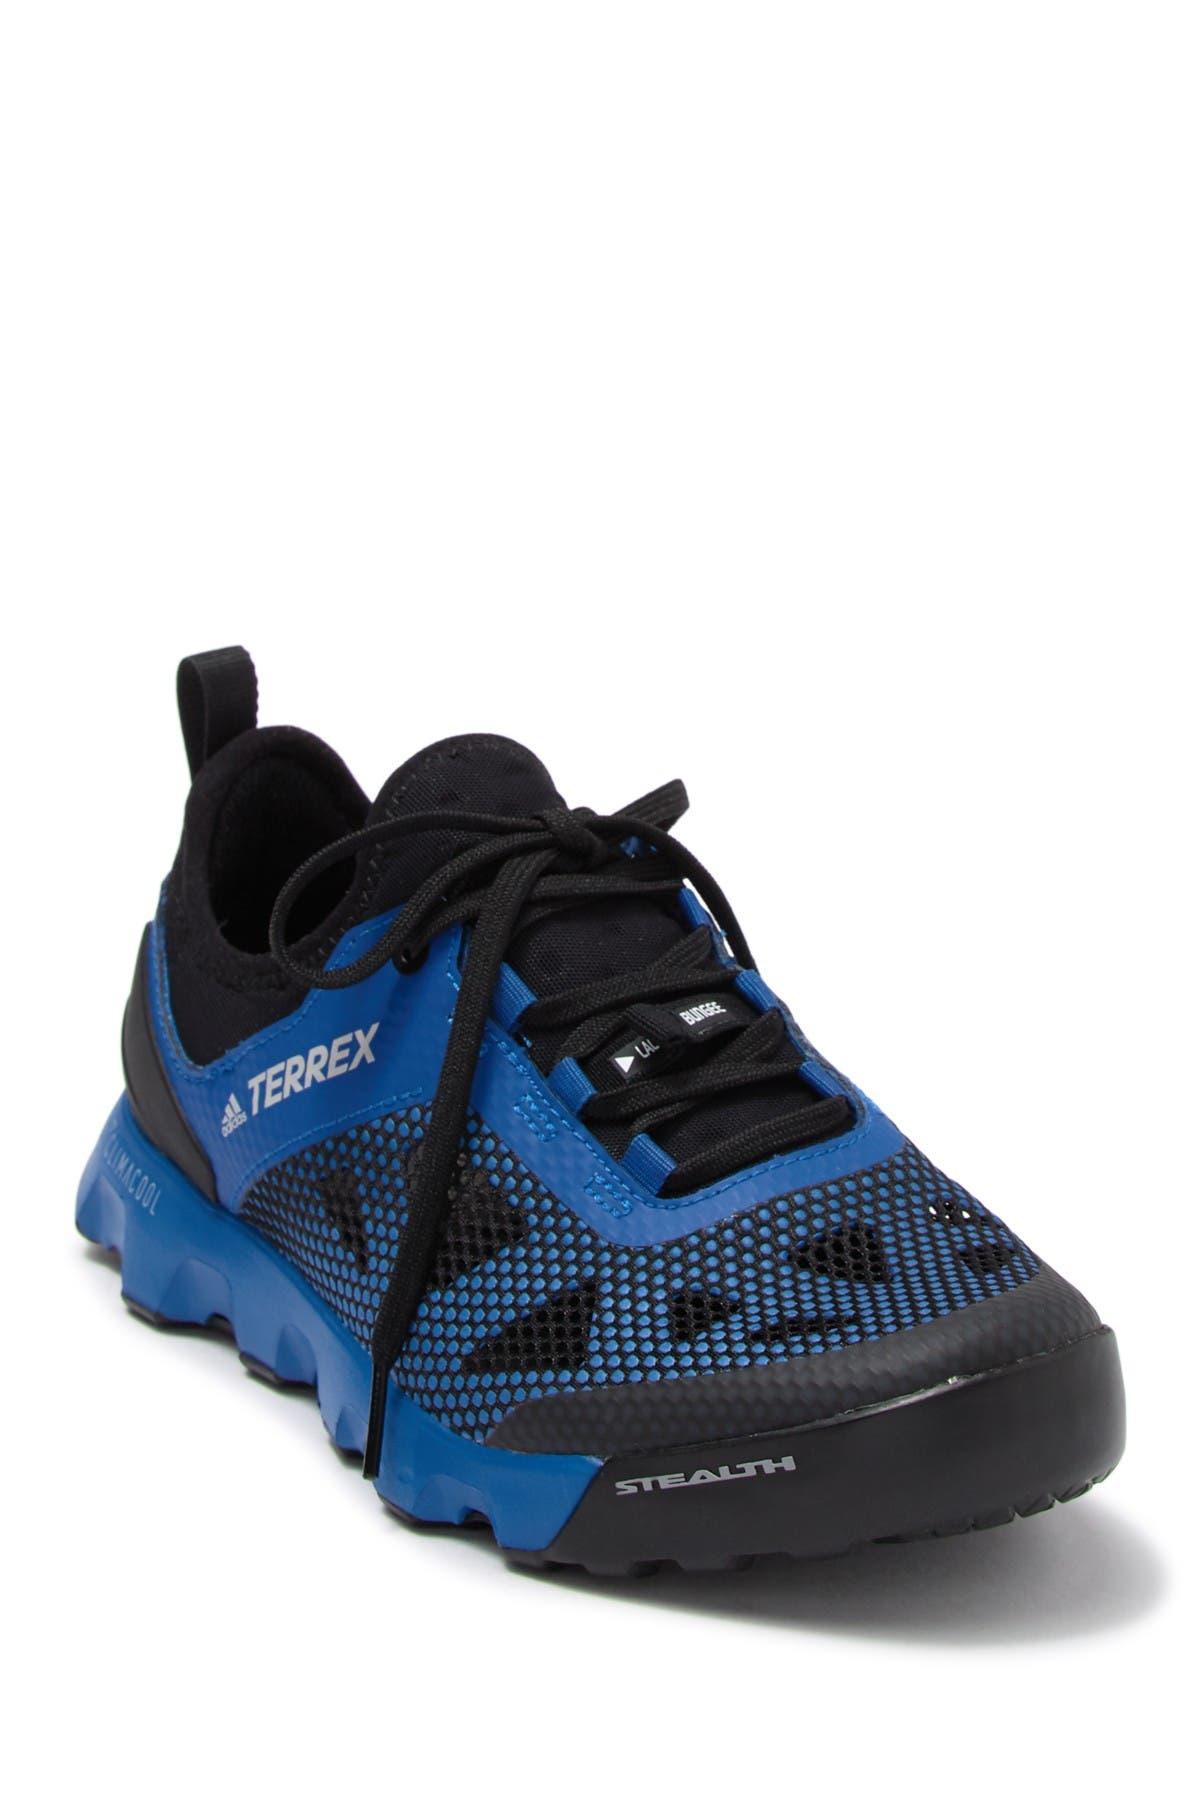 adidas | Terrex CC Voyager Aqua Sneaker